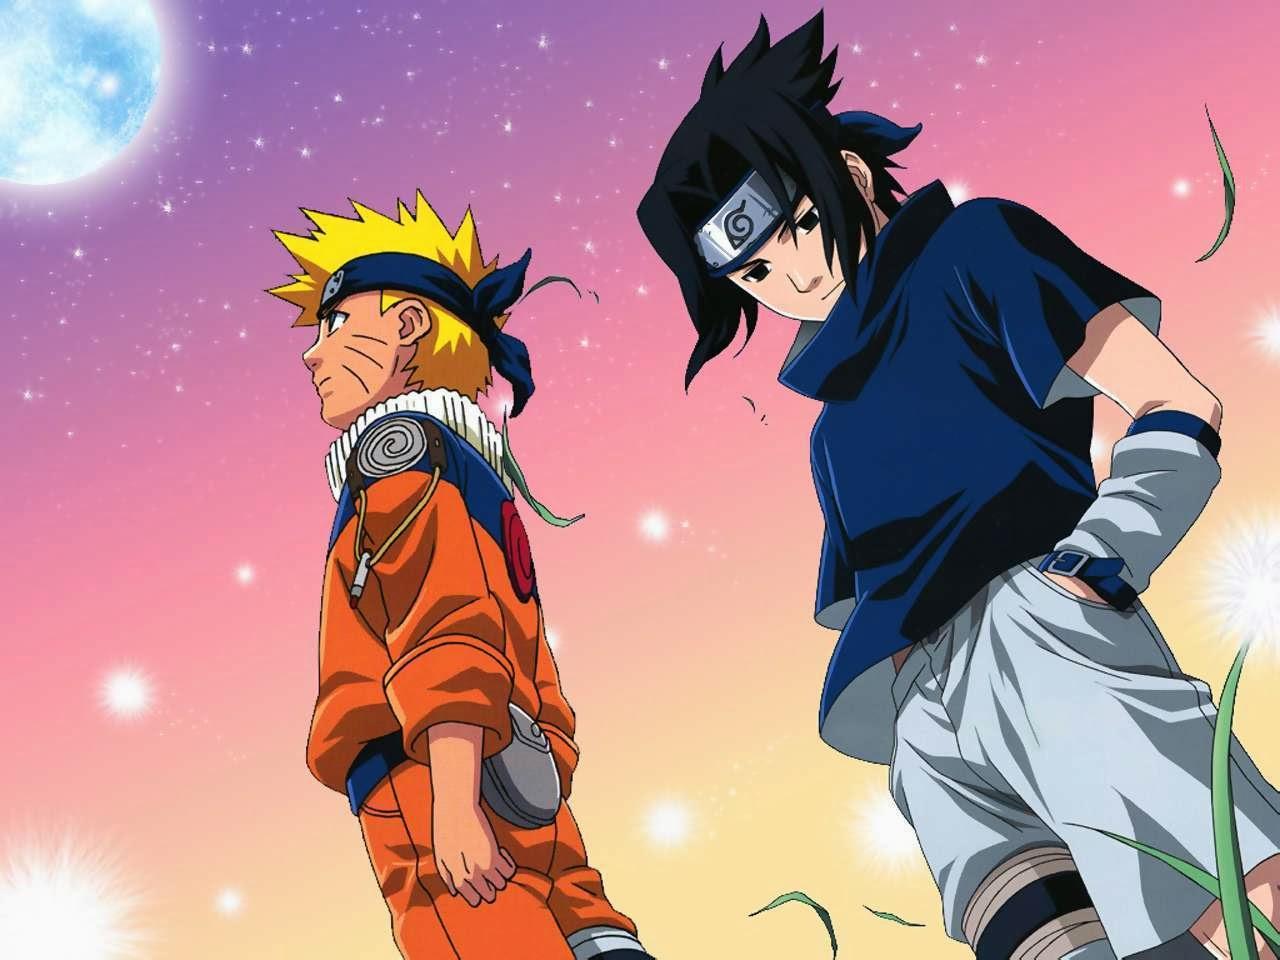 Gambar Kartun Jepang Animasi Bergerak Keren Sasuke Uchiha